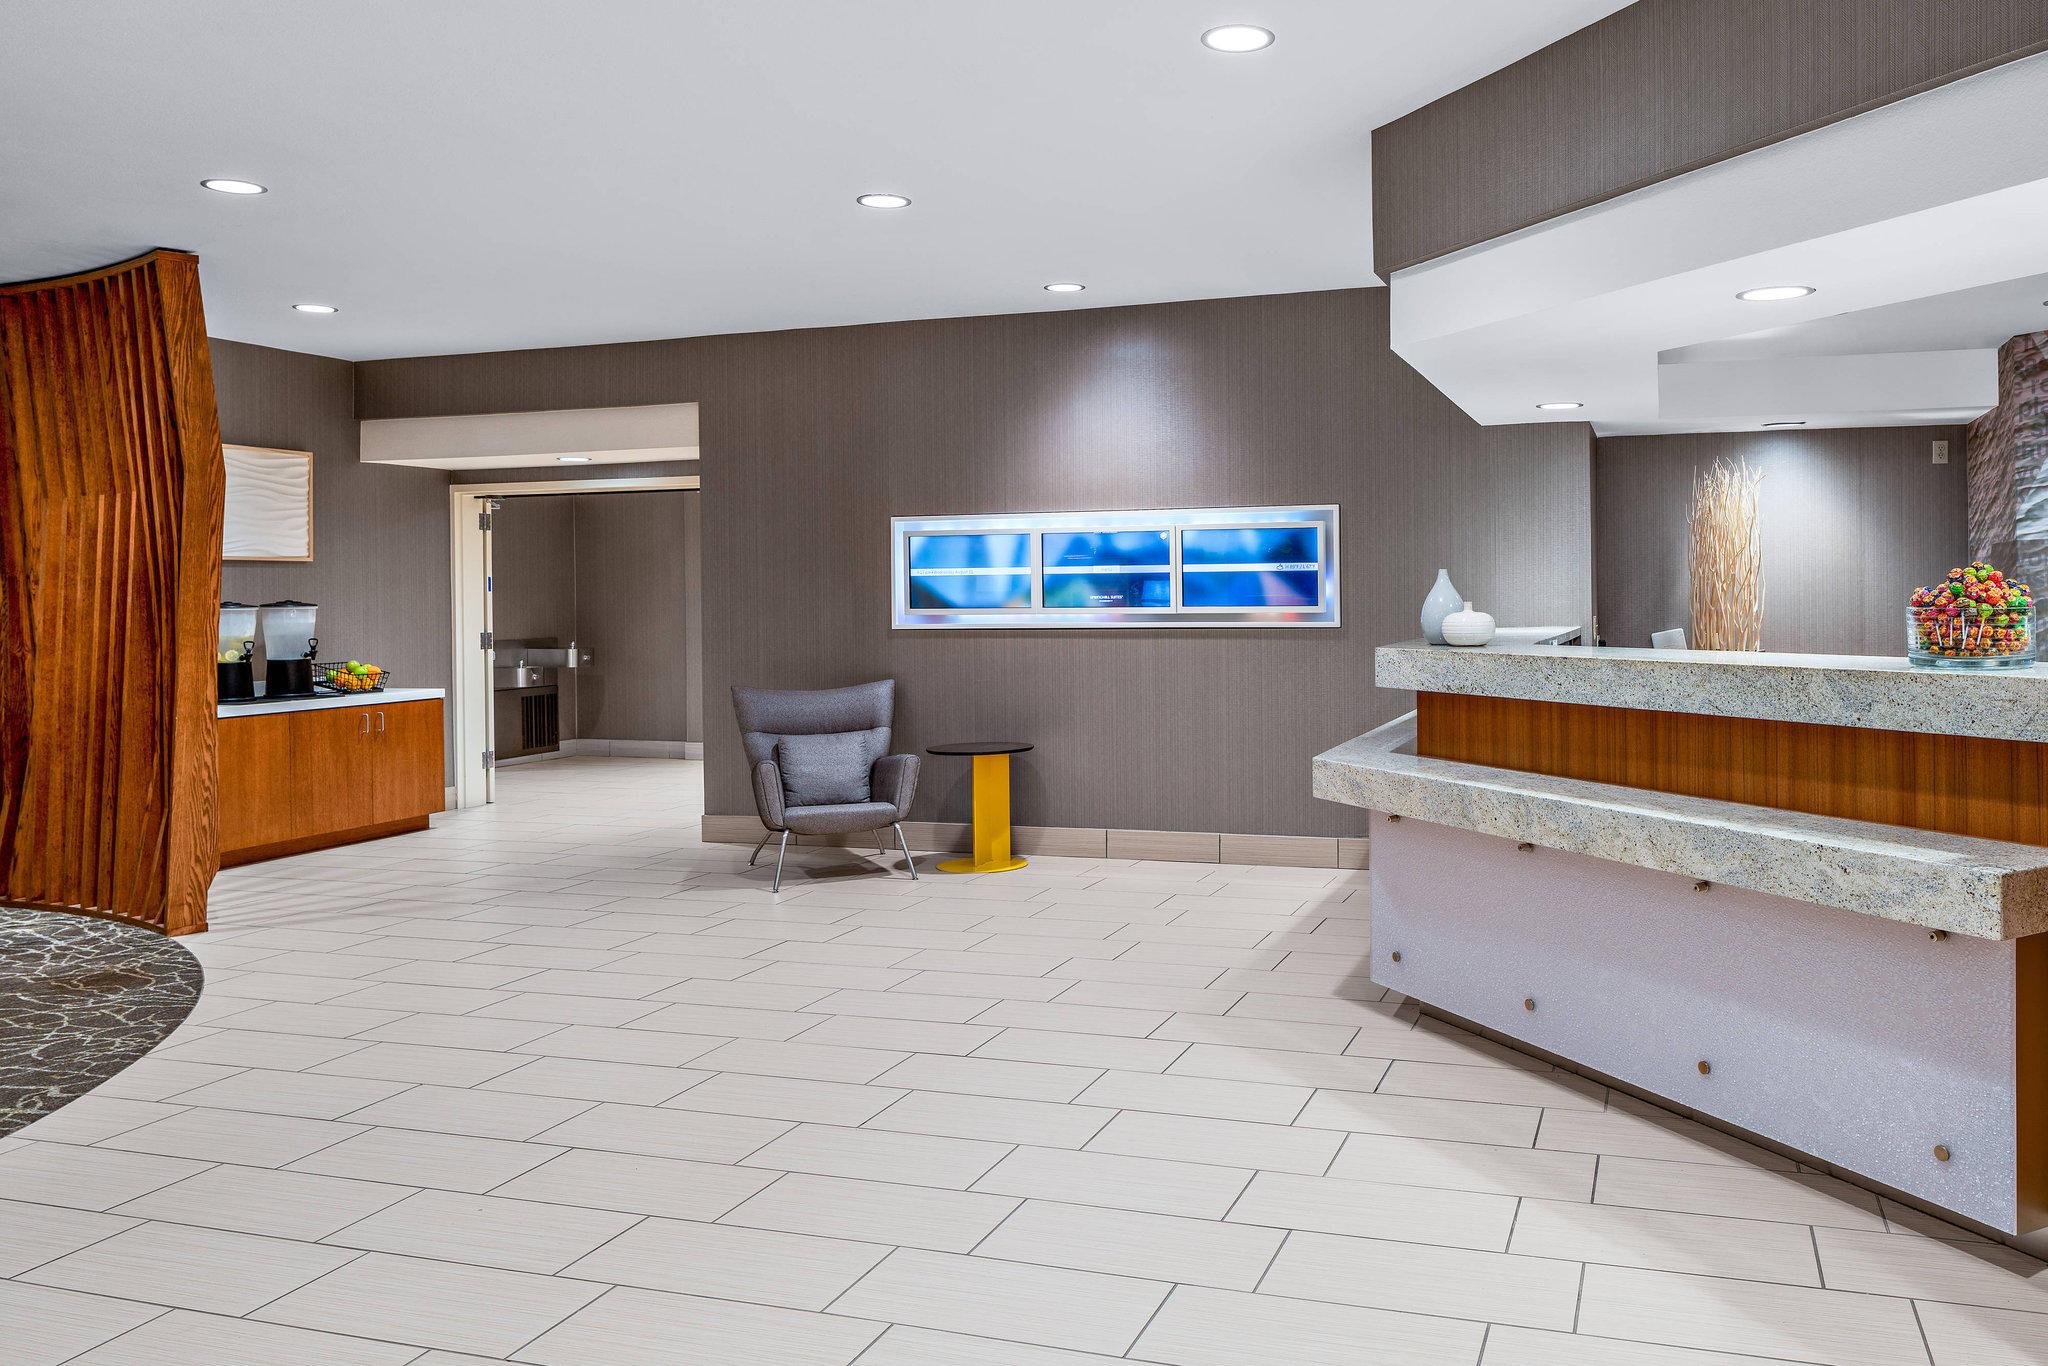 SpringHill Suites by Marriott San Diego Rancho Bernardo/Scripps Poway